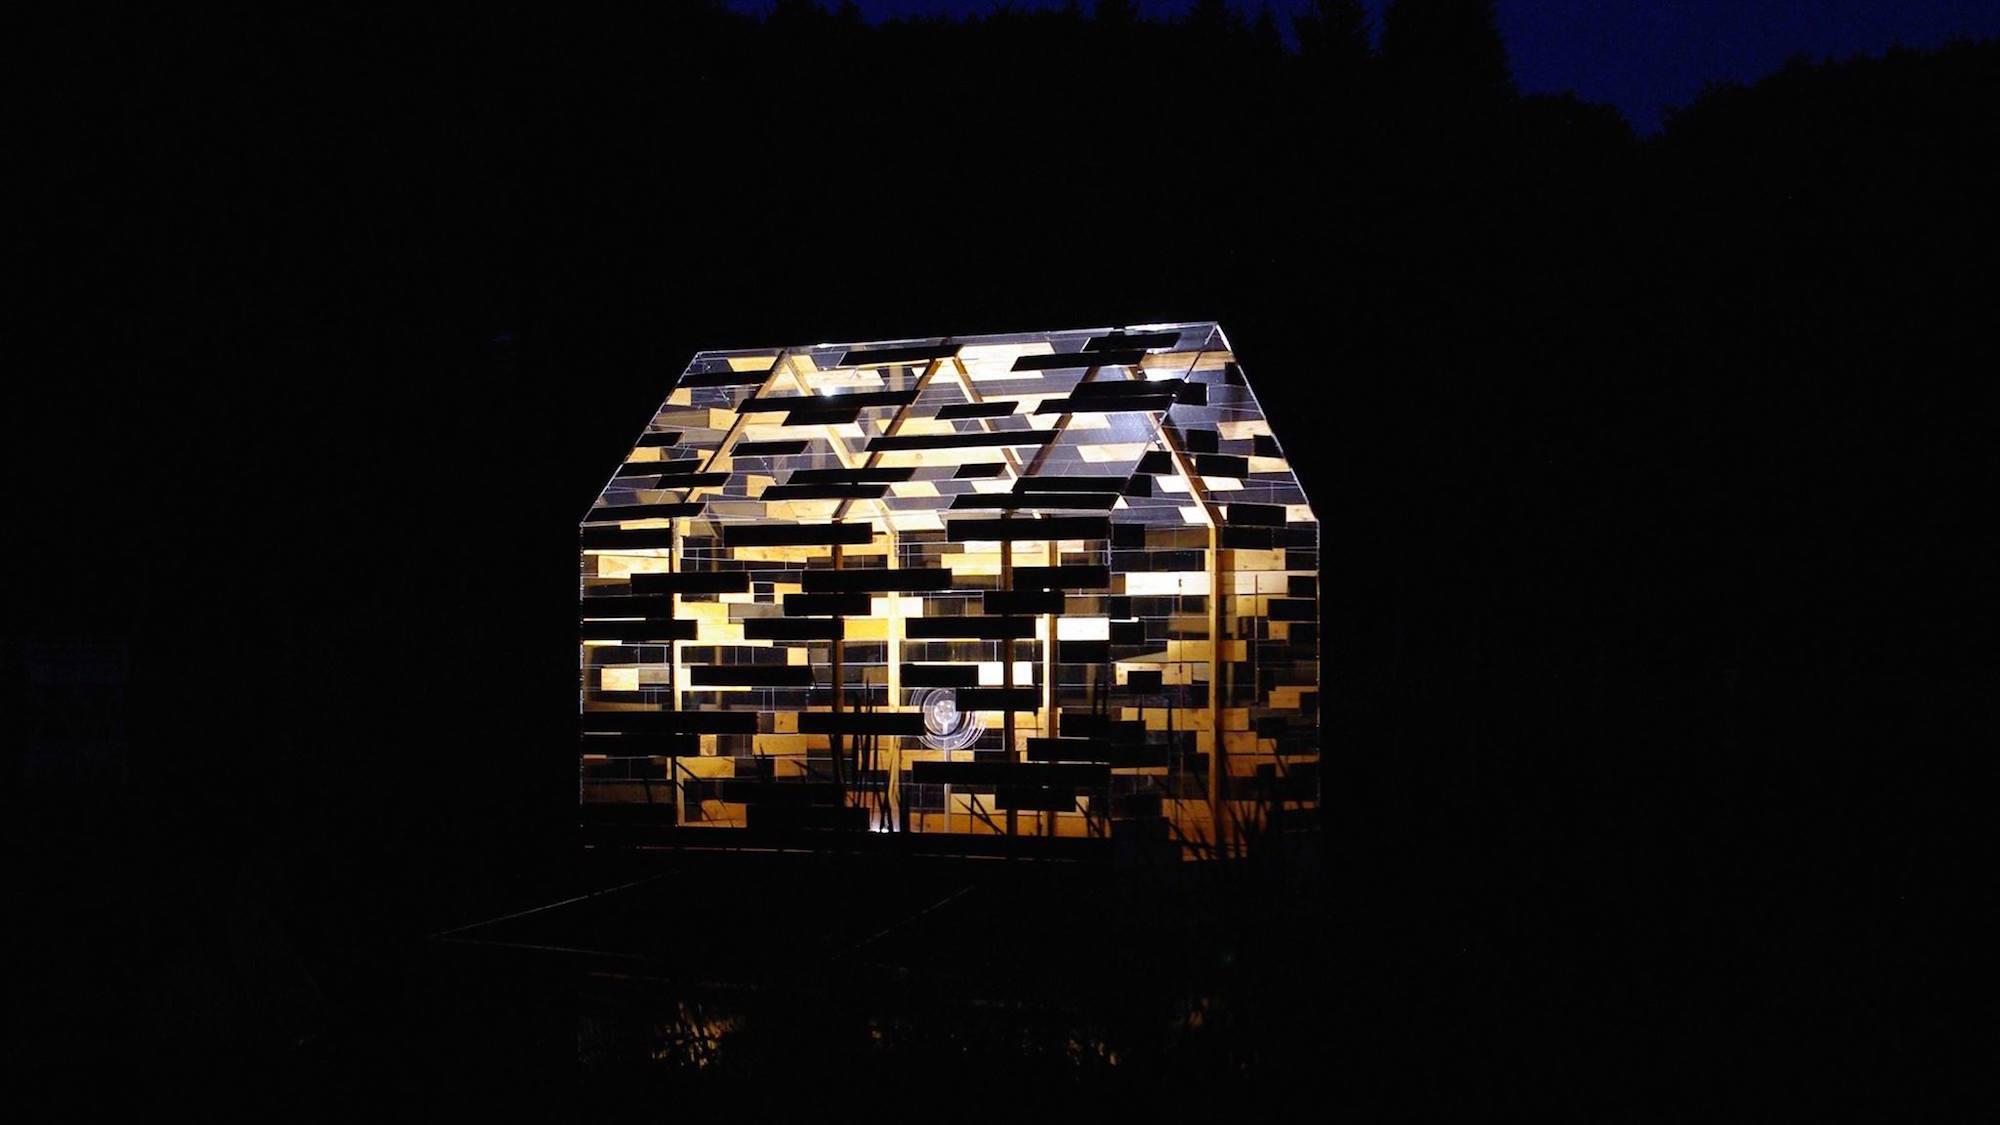 Walden Raft by night © Florent Albinet